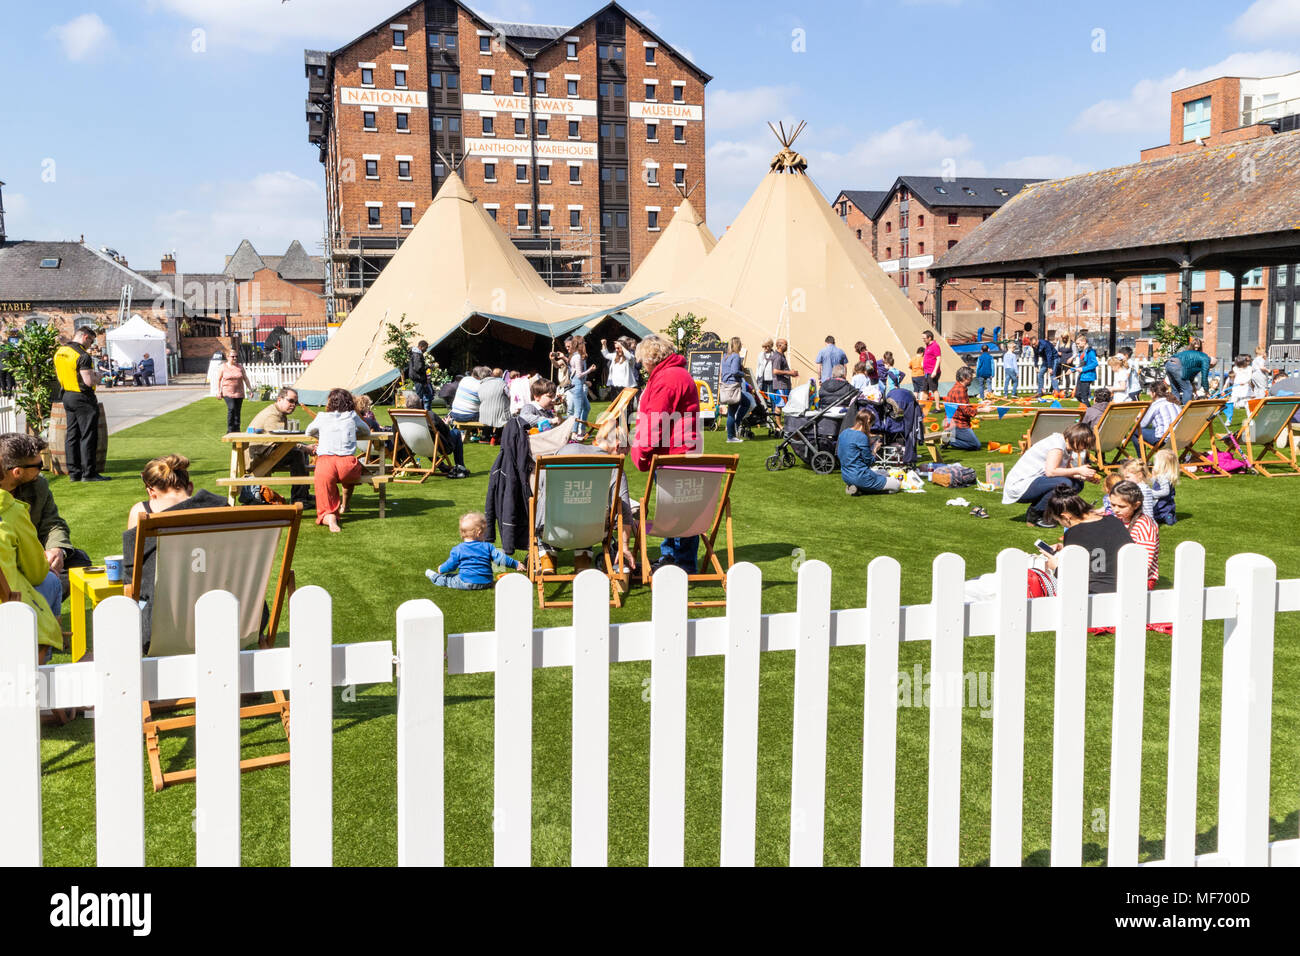 Springtime event in Gloucester Docks, Gloucester UK - Stock Image